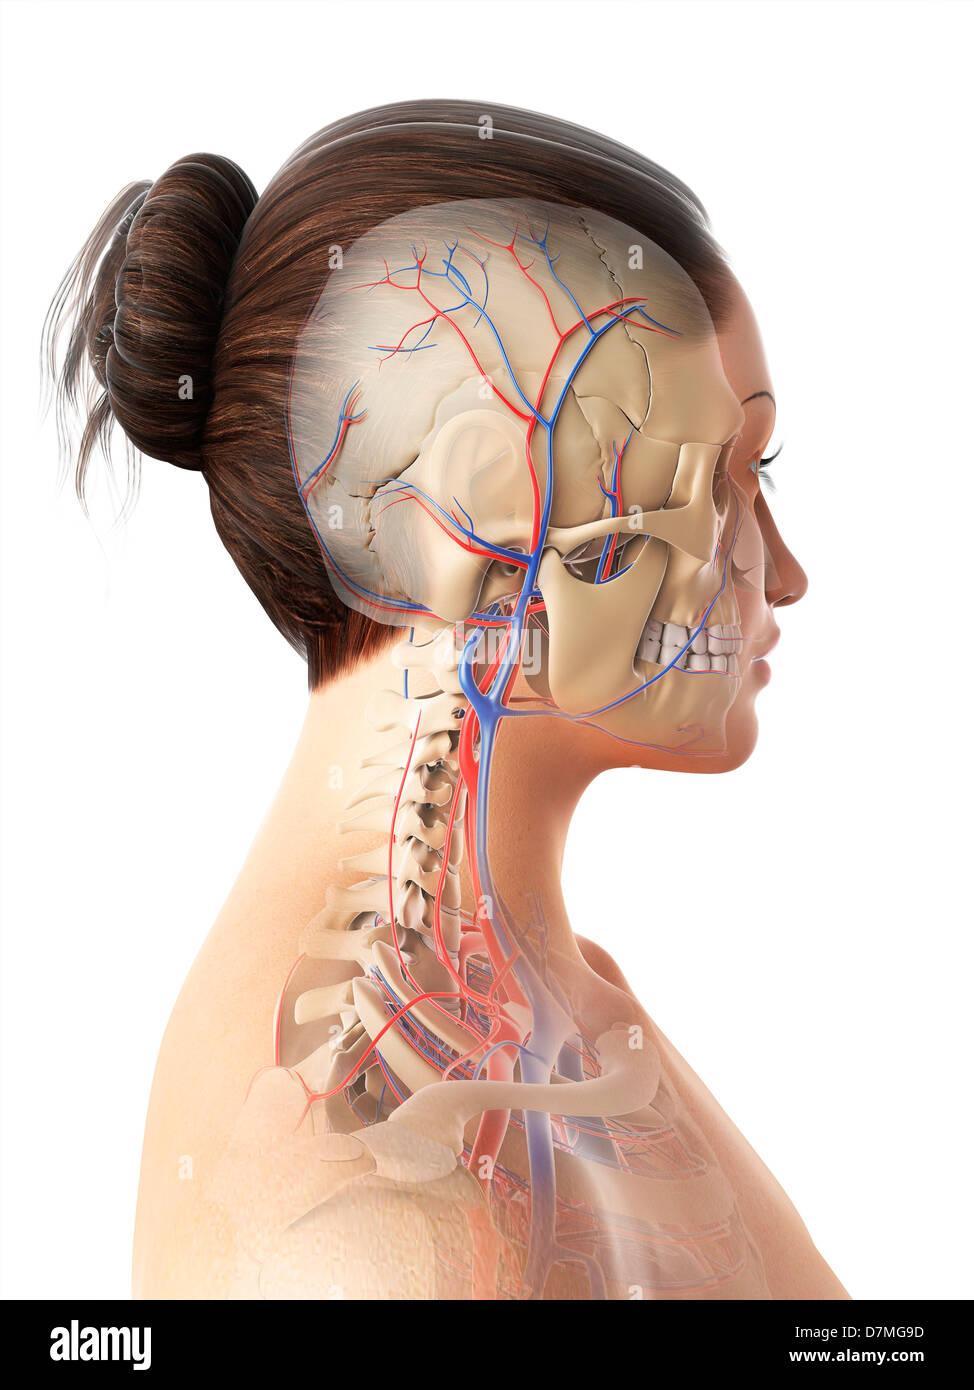 Female vascular system, artwork Stock Photo: 56385545 - Alamy